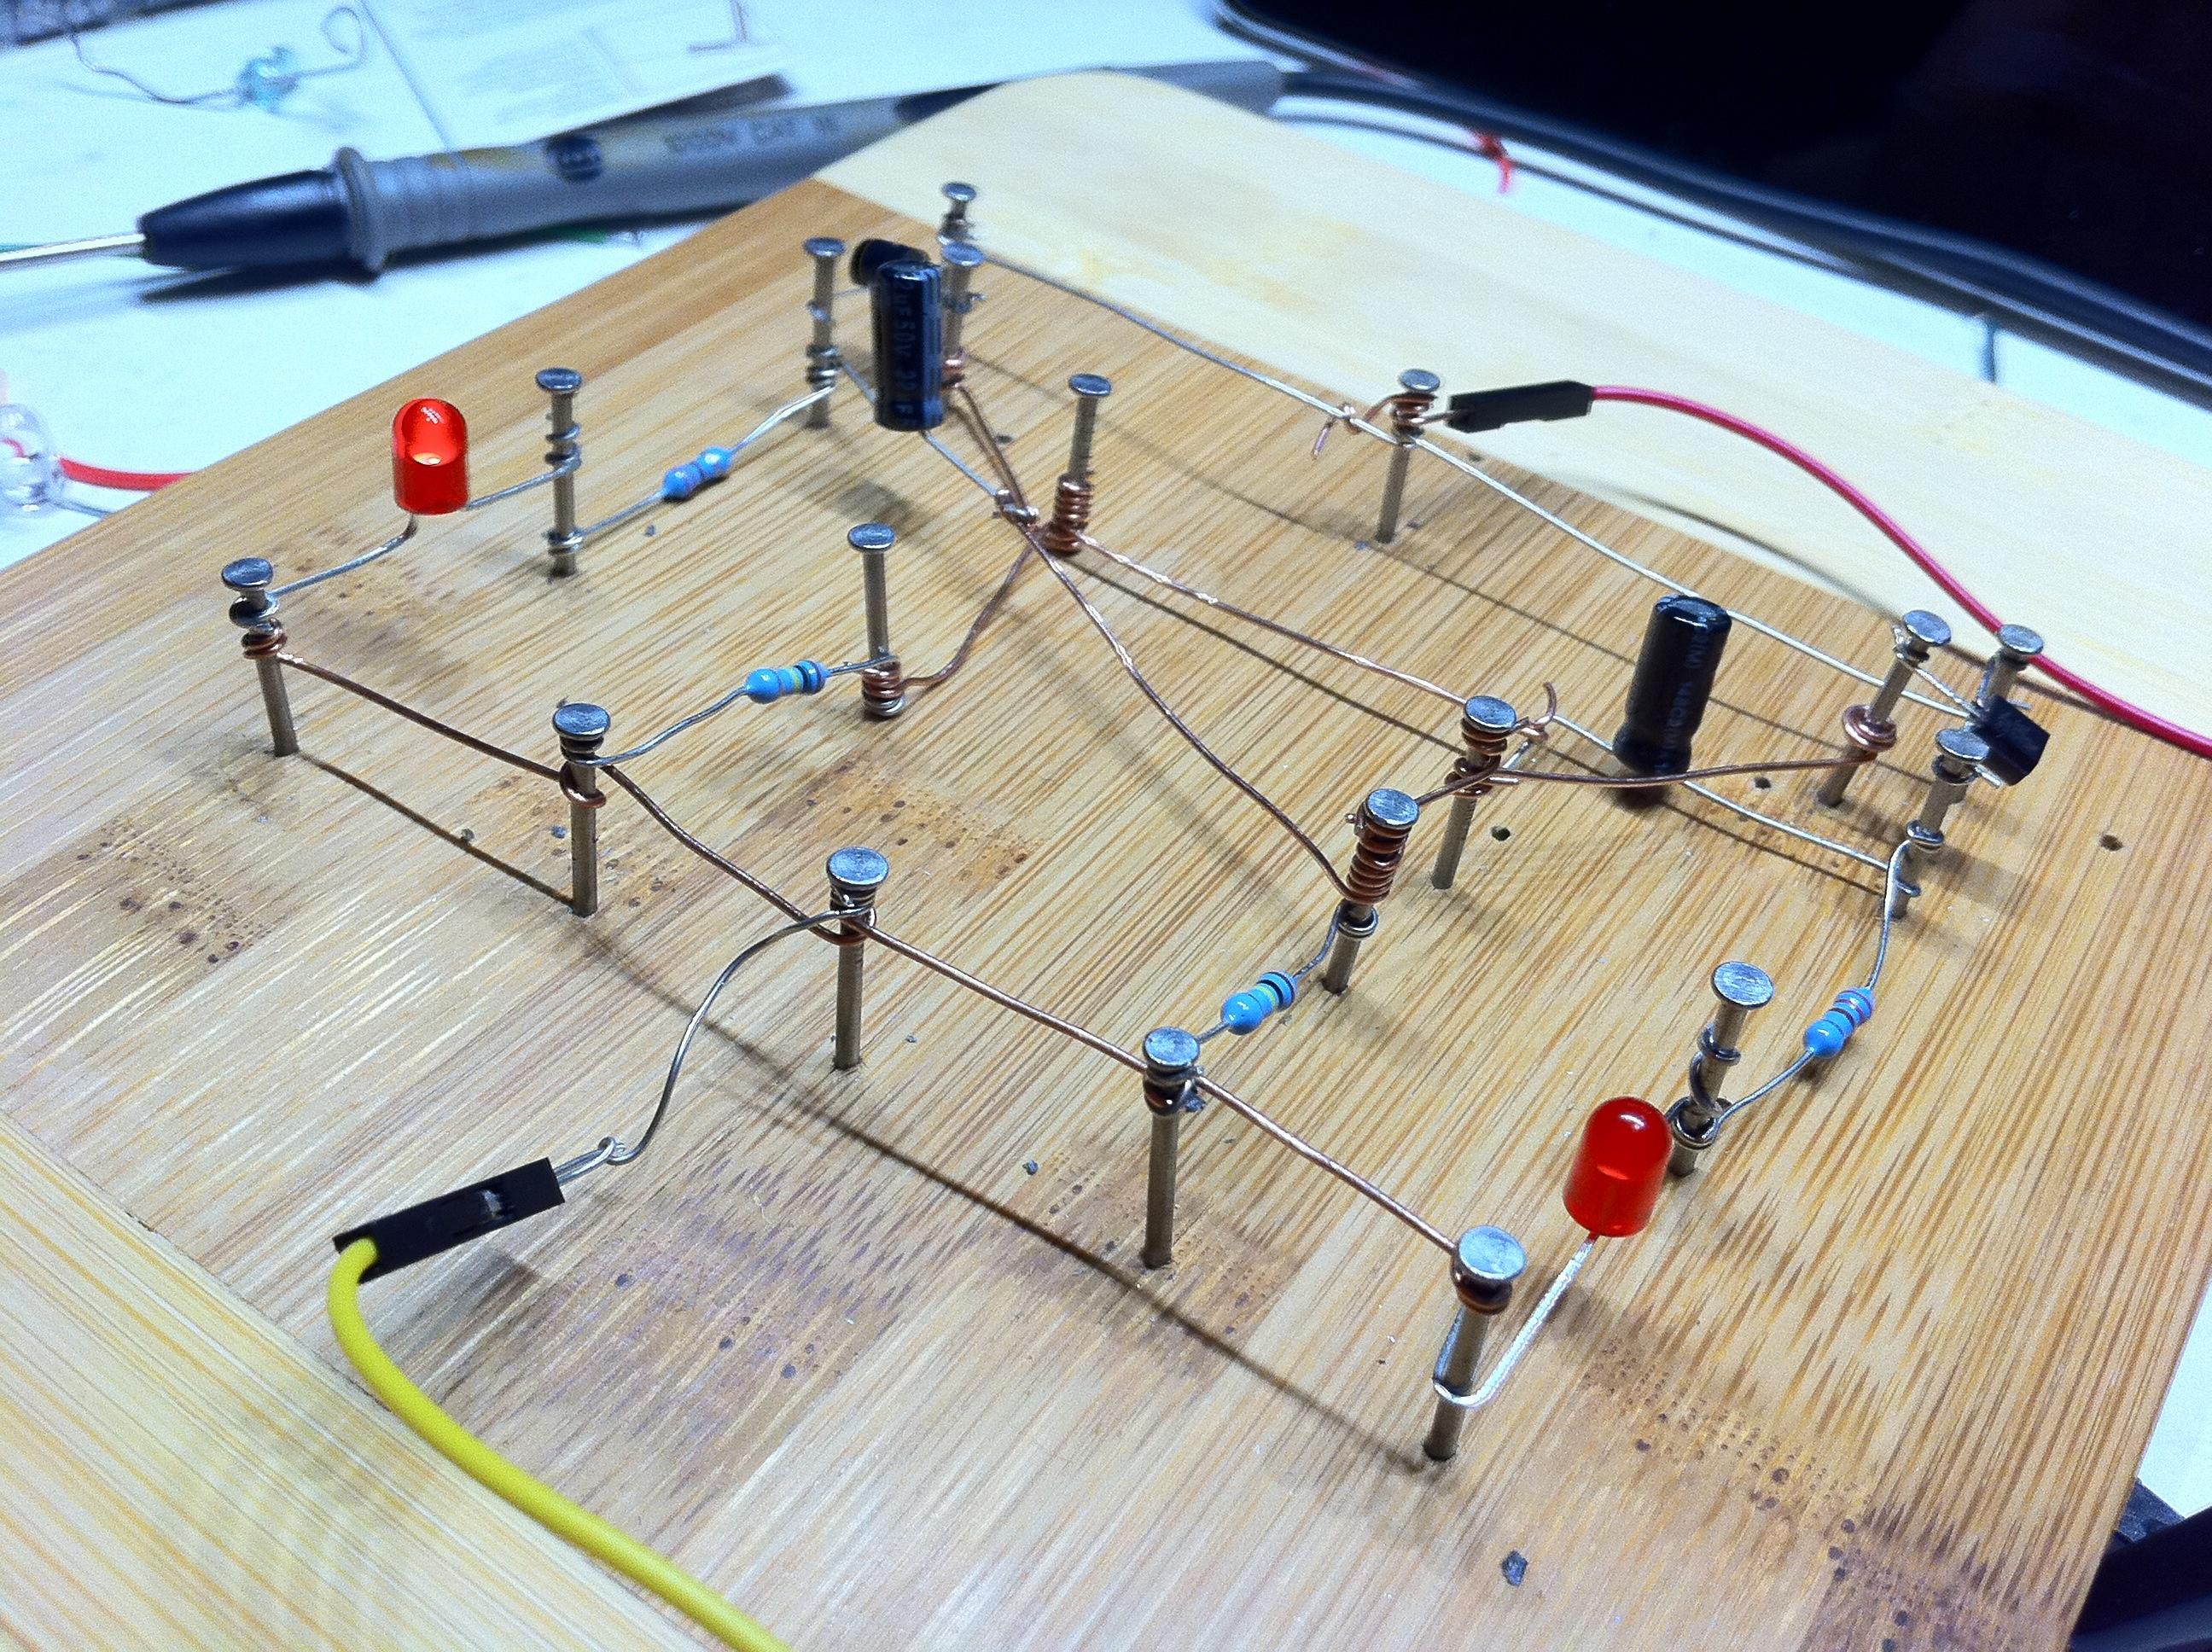 components_5584602310_c95d01c926_o.jpg